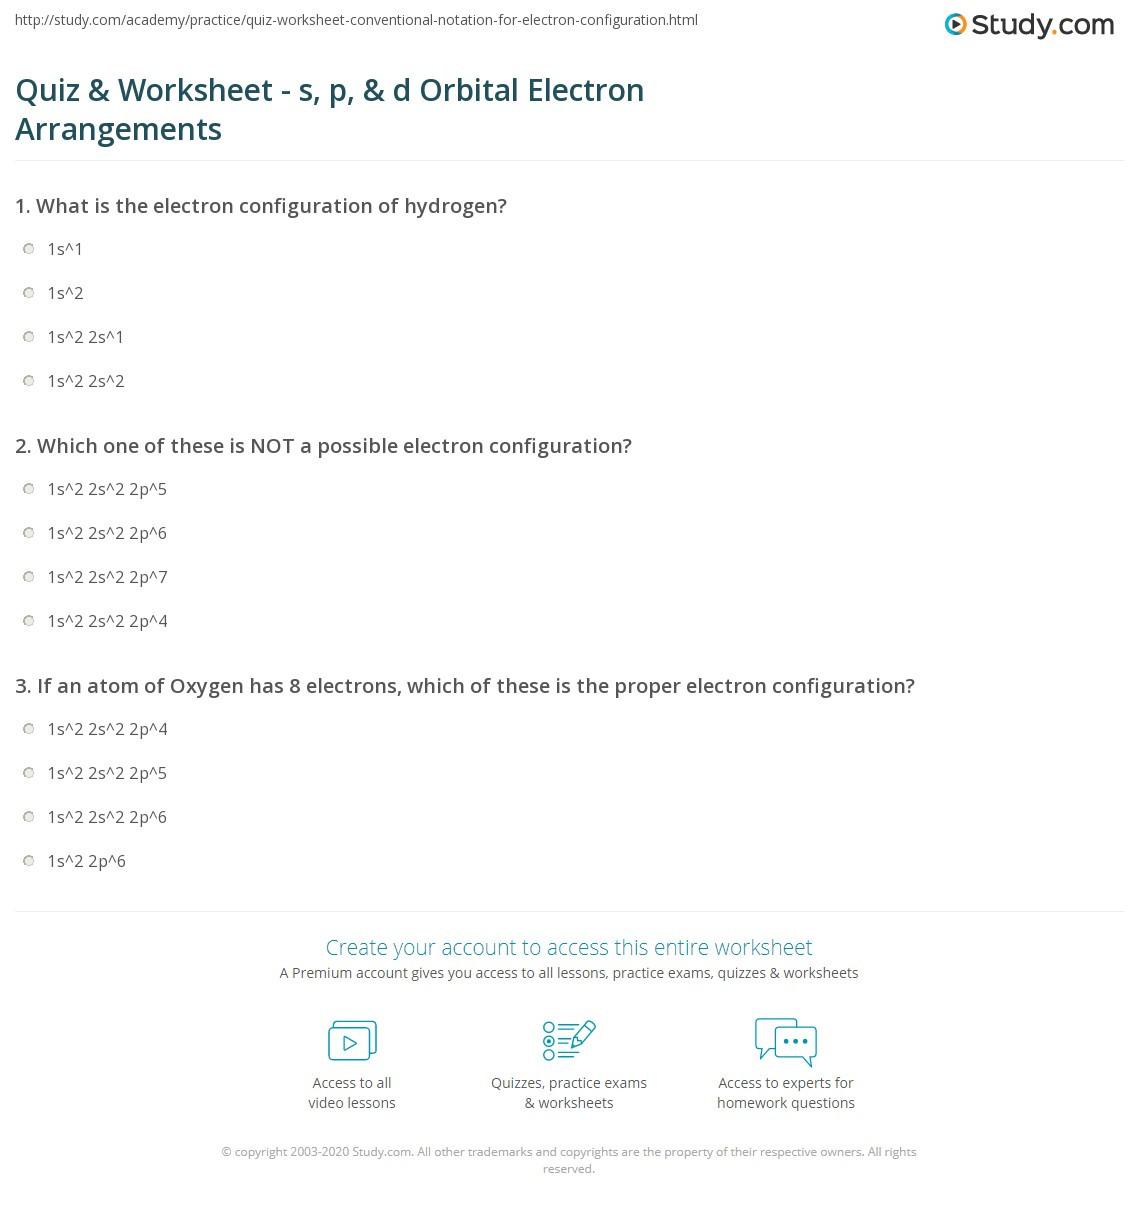 Electron Configuration Worksheet Answers Quiz & Worksheet S P & D orbital Electron Arrangements